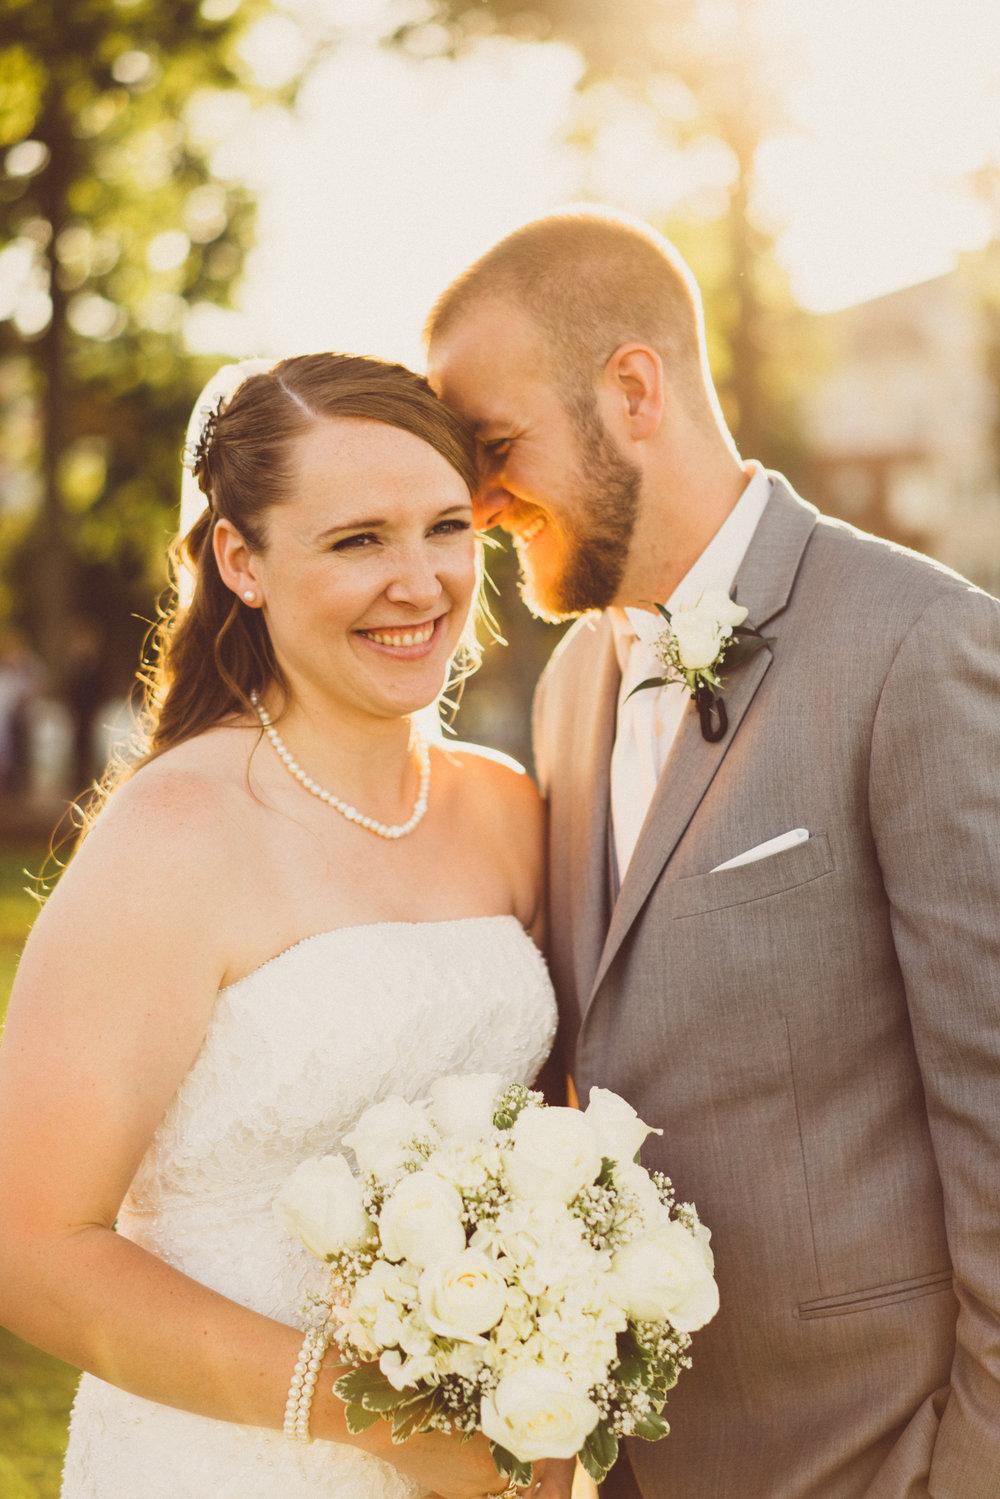 Mike_Steinmetz_Virginia_Wedding_Photographer_Favorites-18.jpg